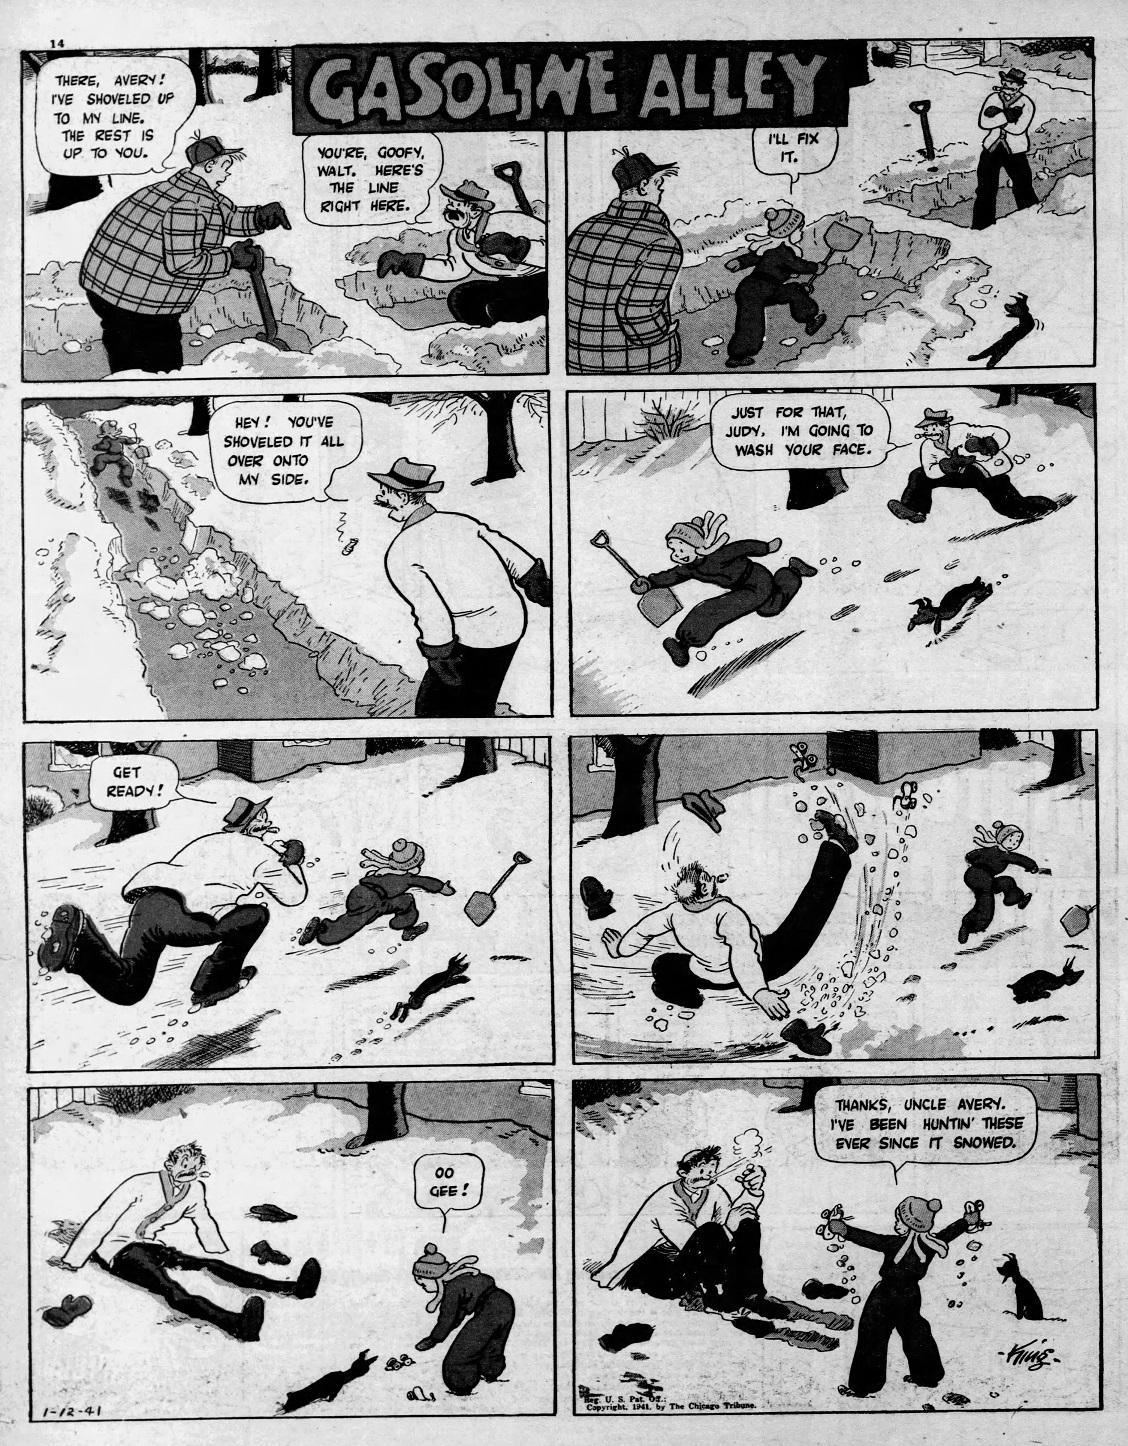 Daily_News_Sun__Jan_12__1941_(8).jpg